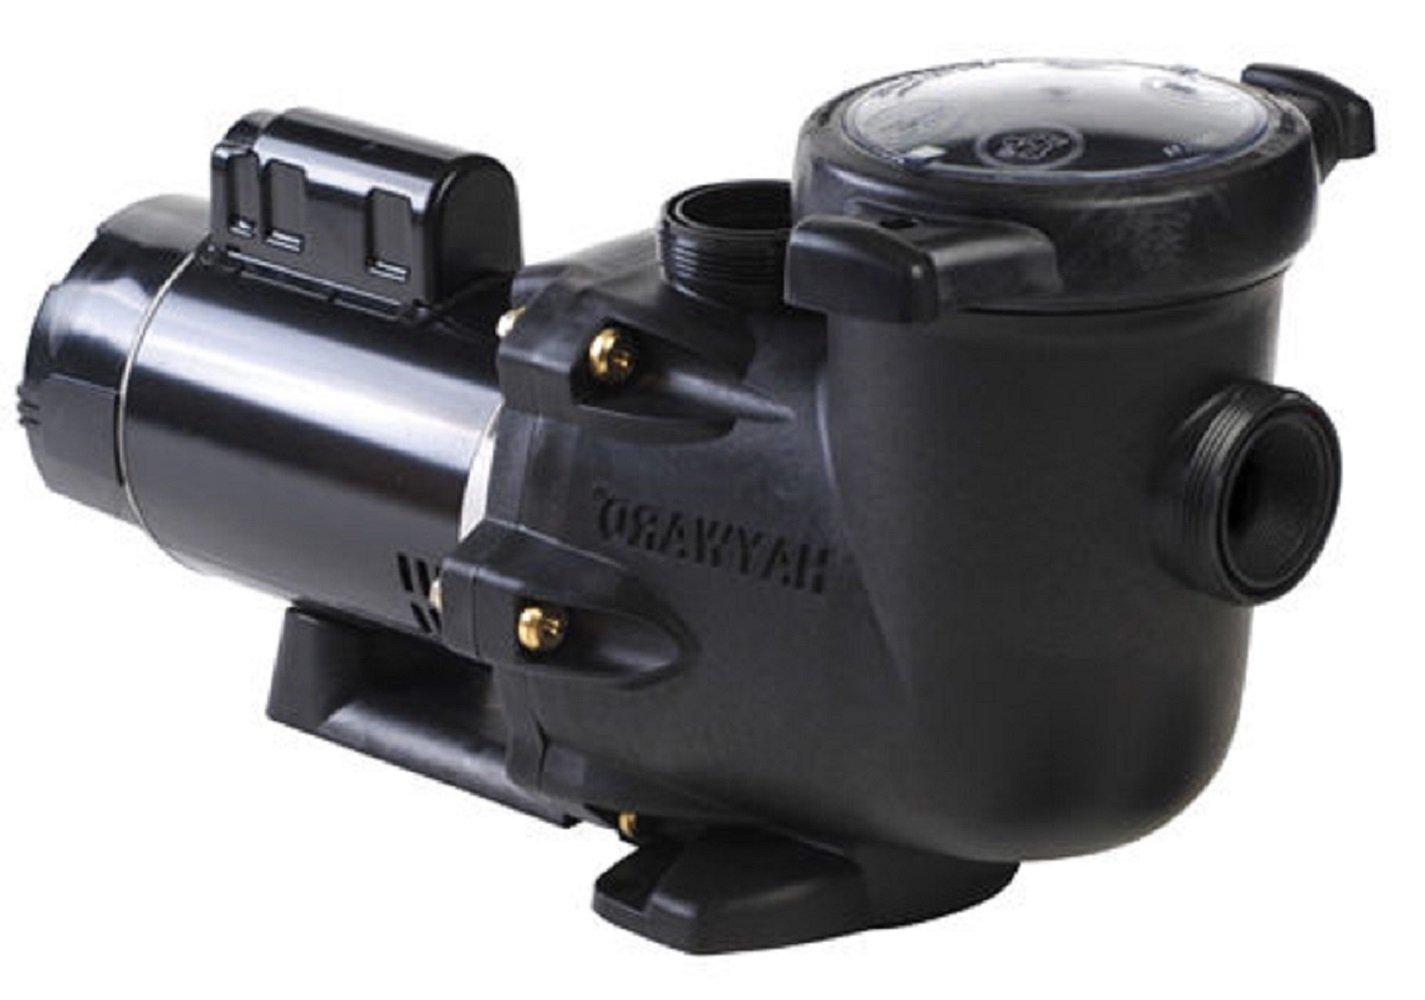 Hayward SP3210X152 1.5 HP Pool Pump, TriStar, Dual-Speed